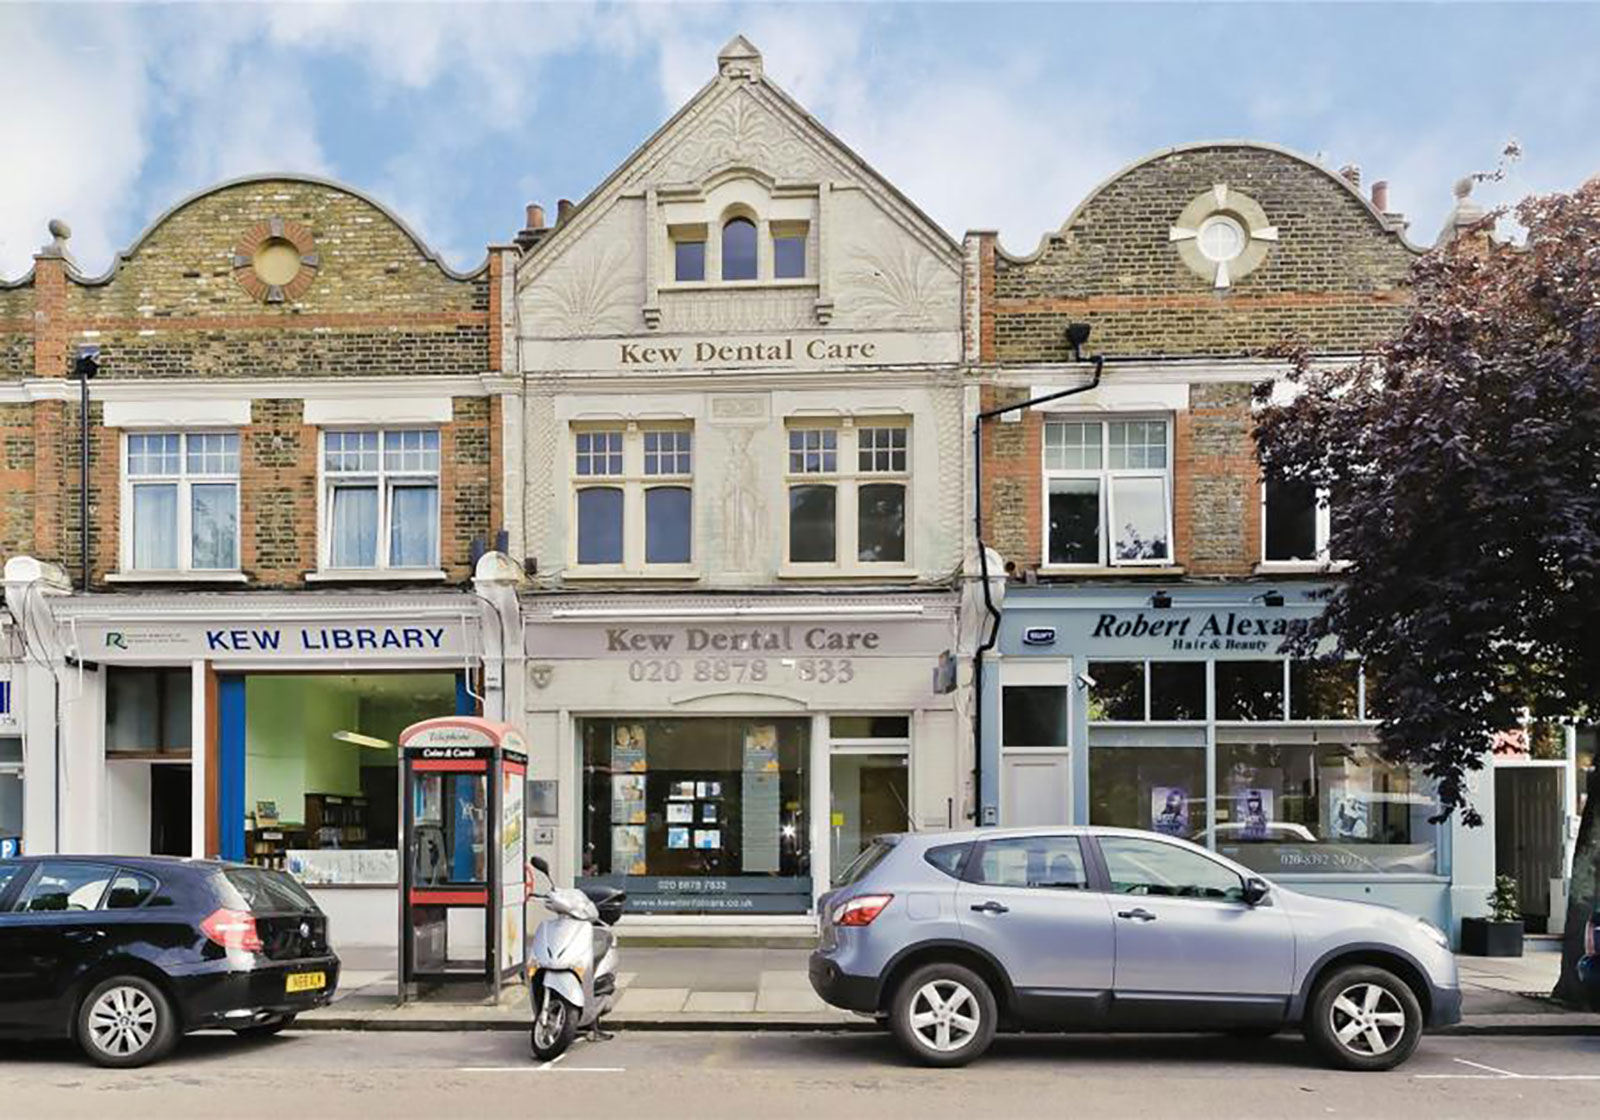 105A North Road, Kew, Richmond, TW9 4HJ - Antony Roberts